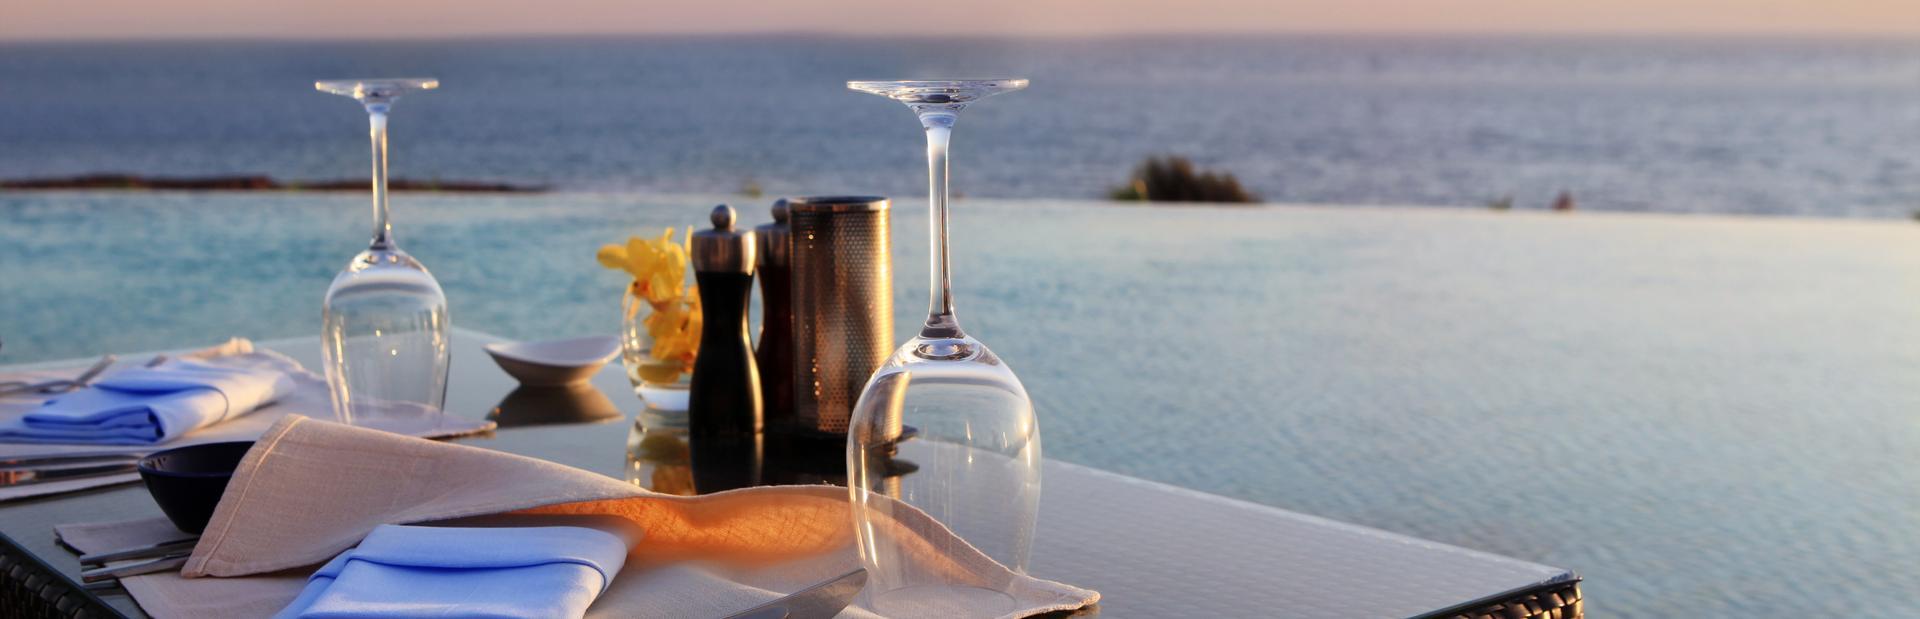 Eat & drink in the US Virgin Islands